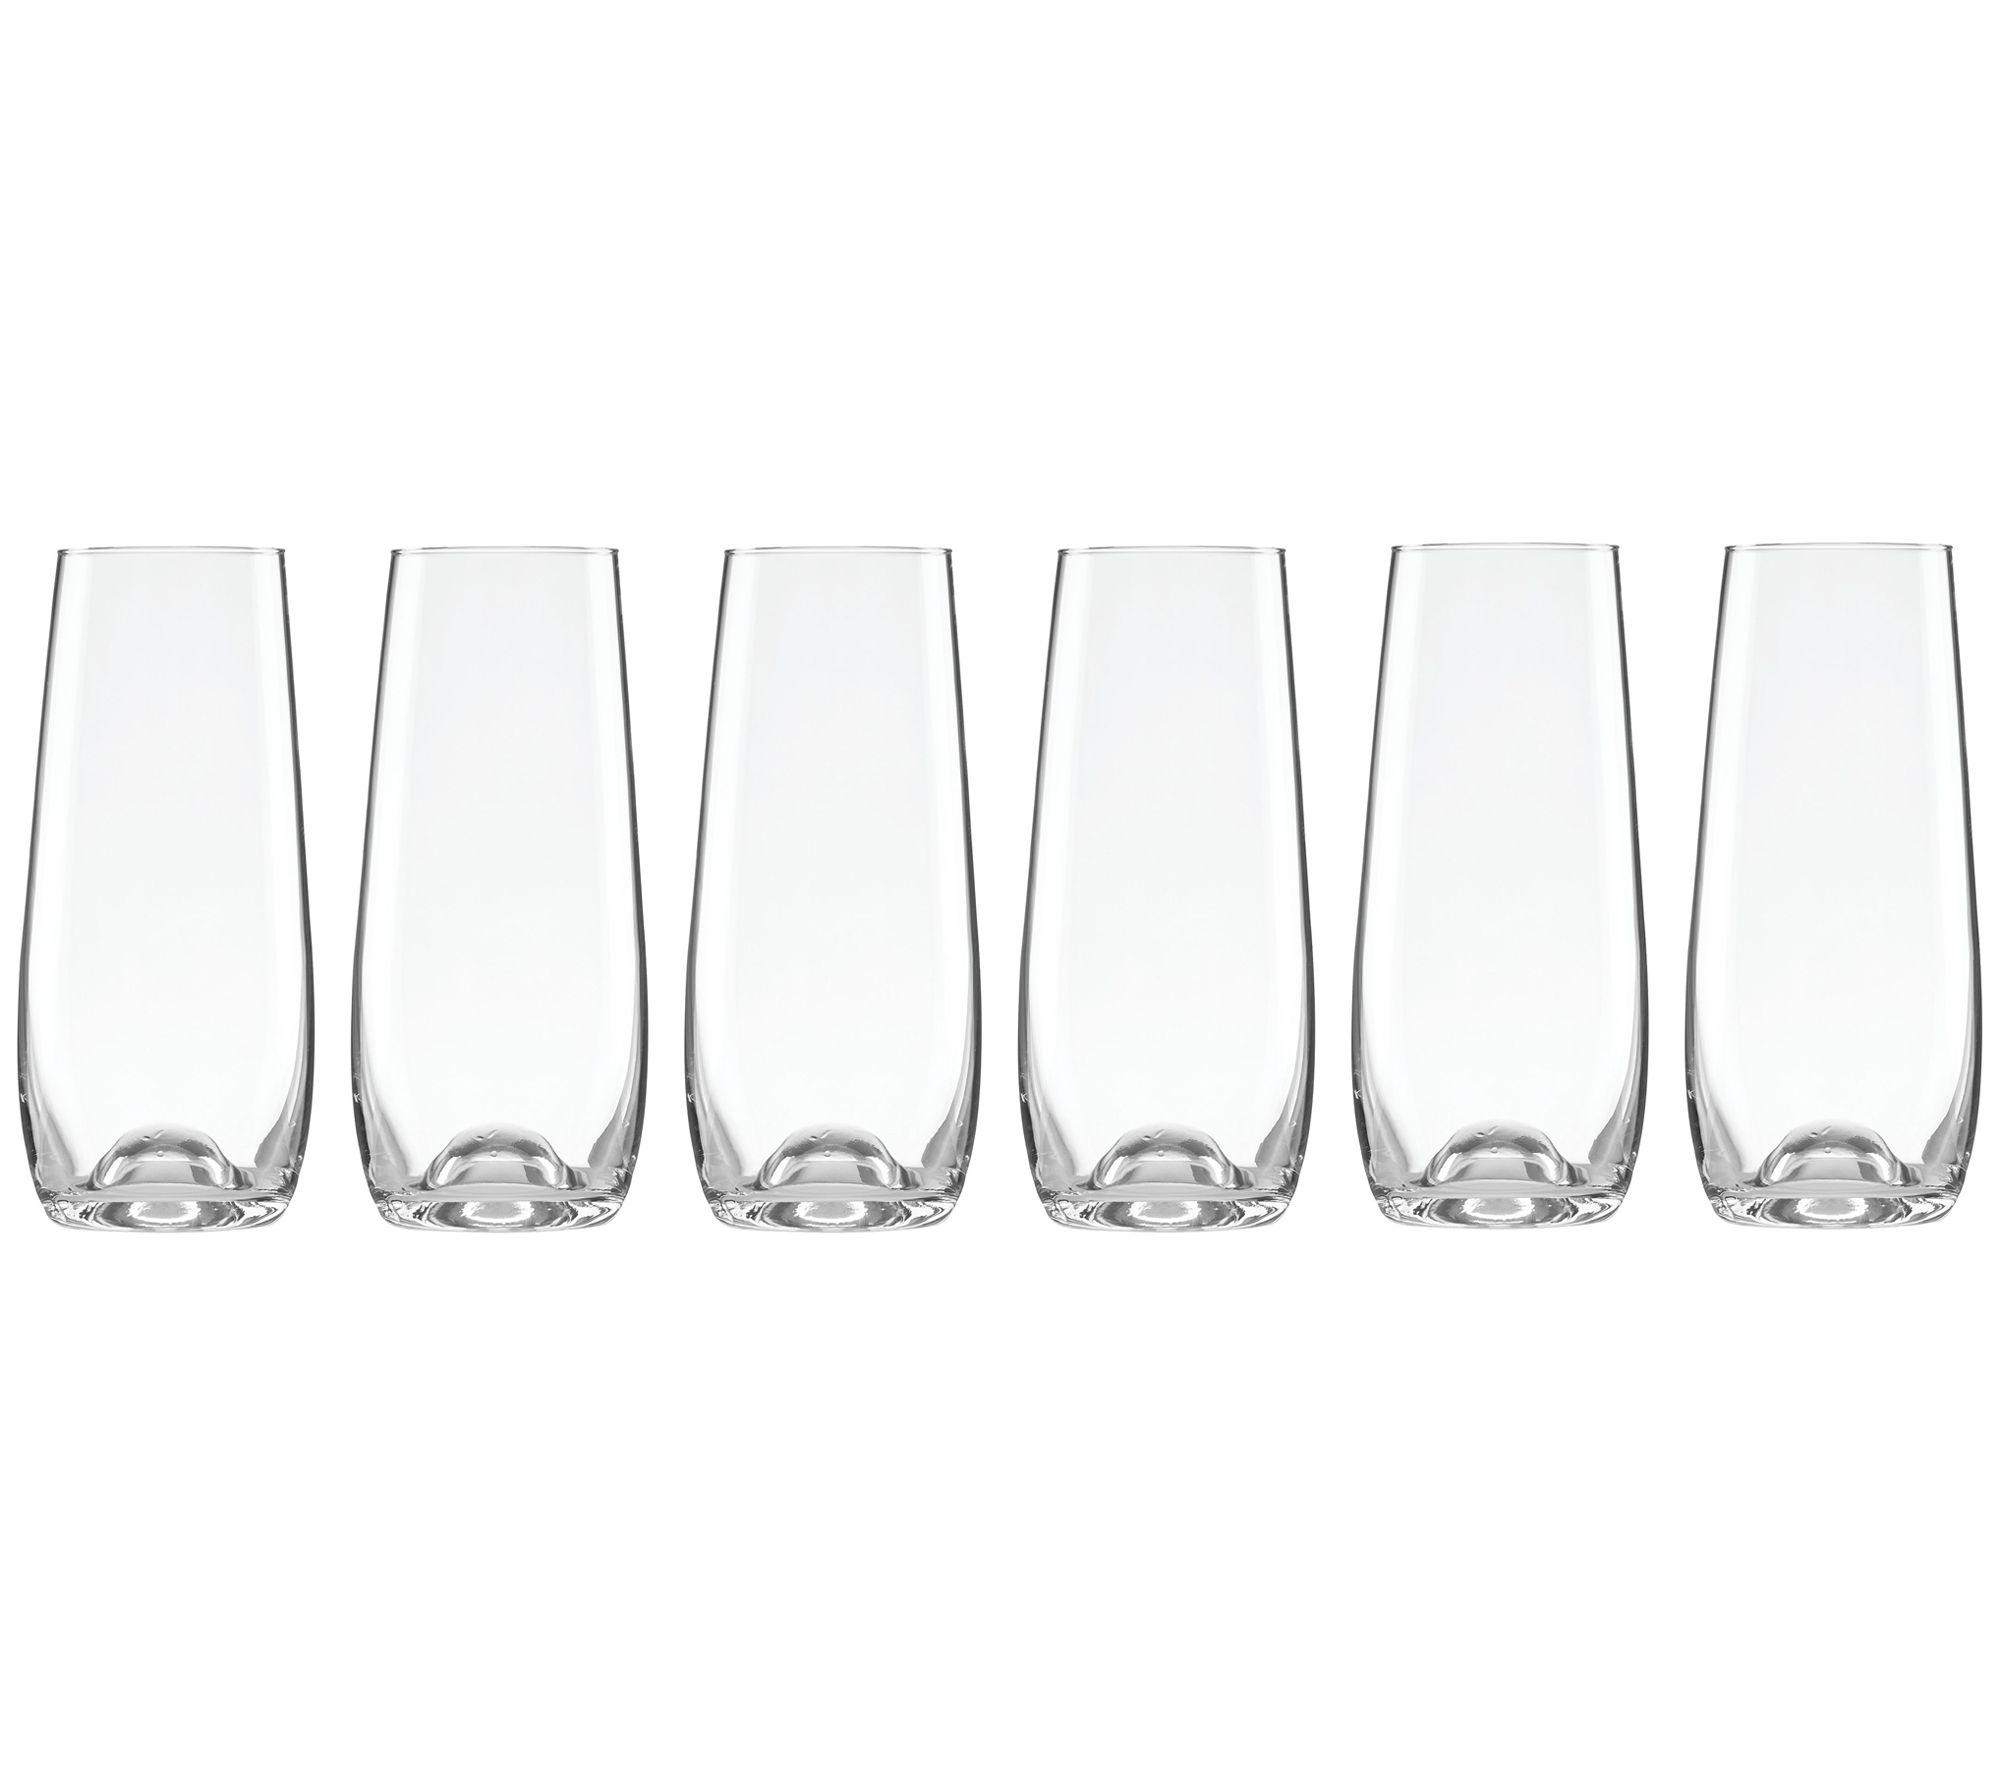 Set of 6 Libbey Stemless Flute Glasses